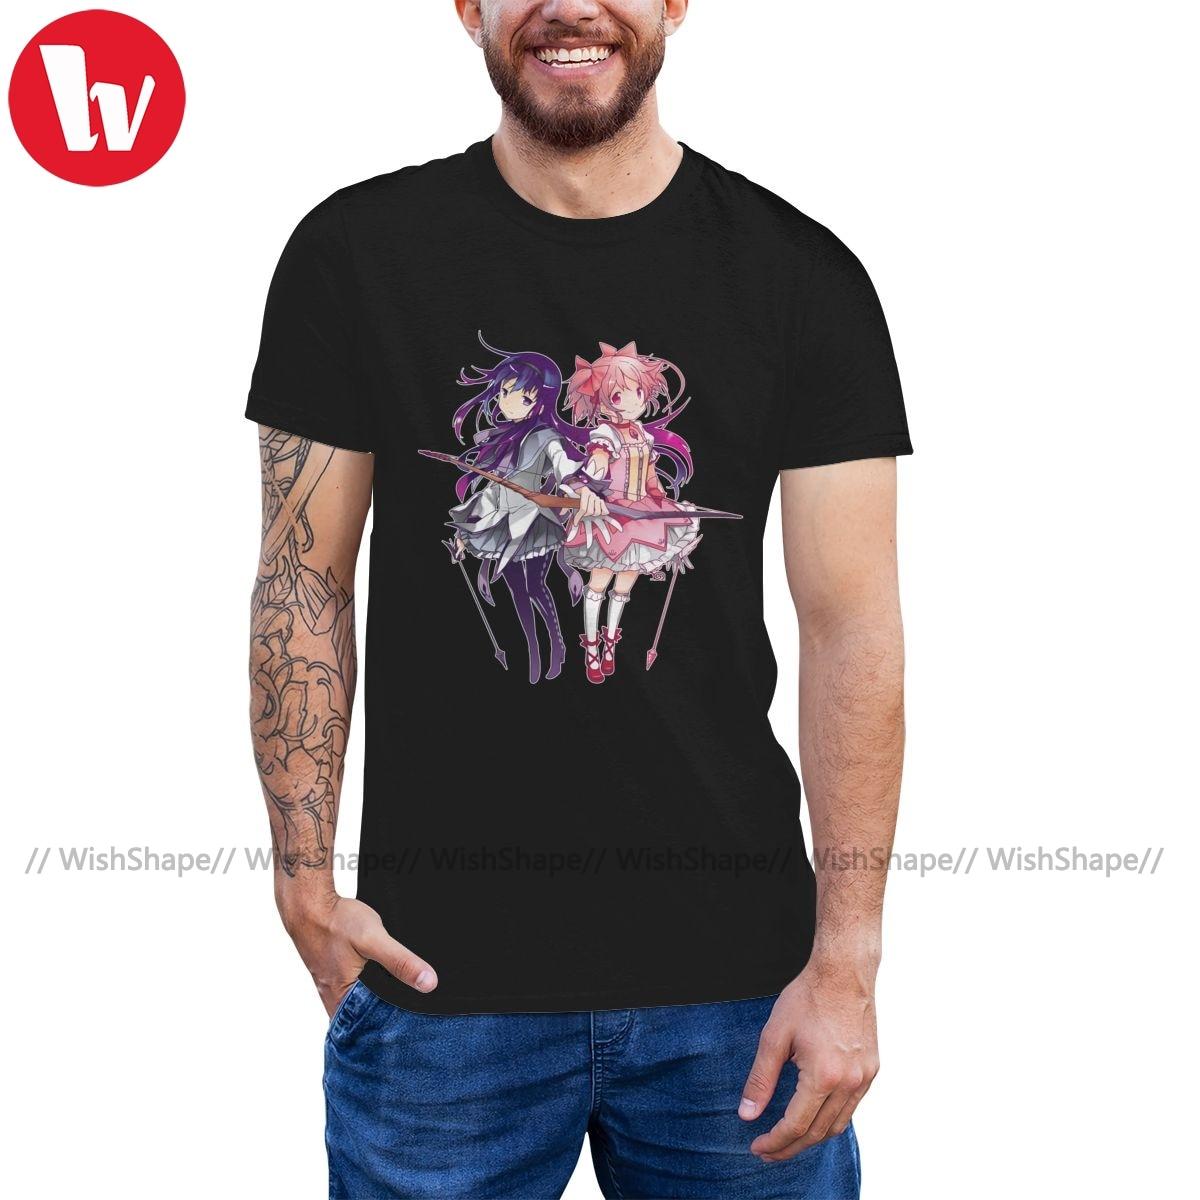 Camiseta Madoka Magica, camiseta Homura Madoka, camiseta grande para hombre, camiseta Casual de manga corta, camisa divertida